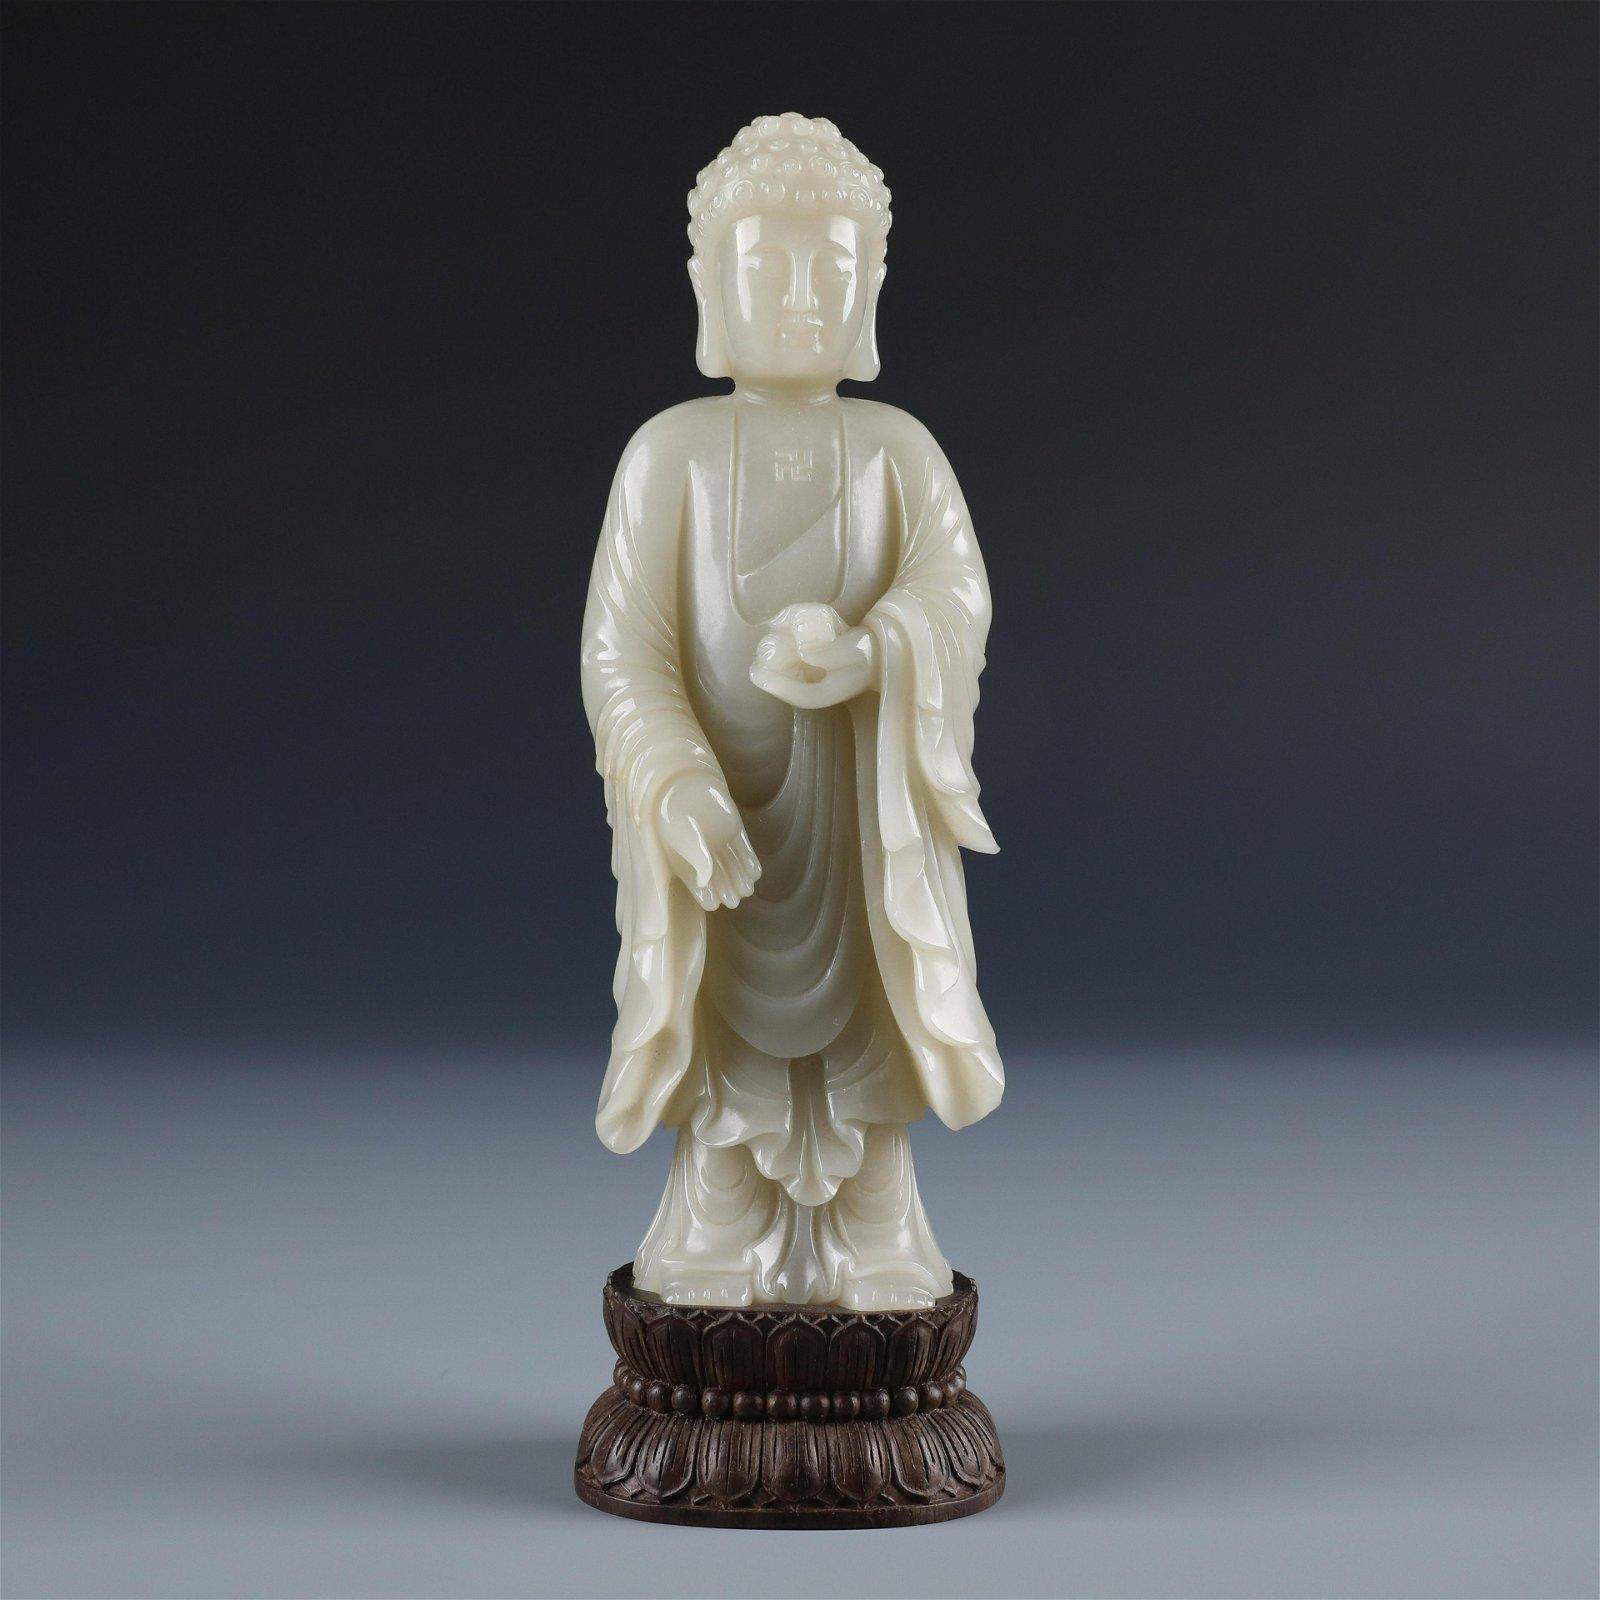 A Chinese Carved Celadon Jade  Figure of Sakyamuni